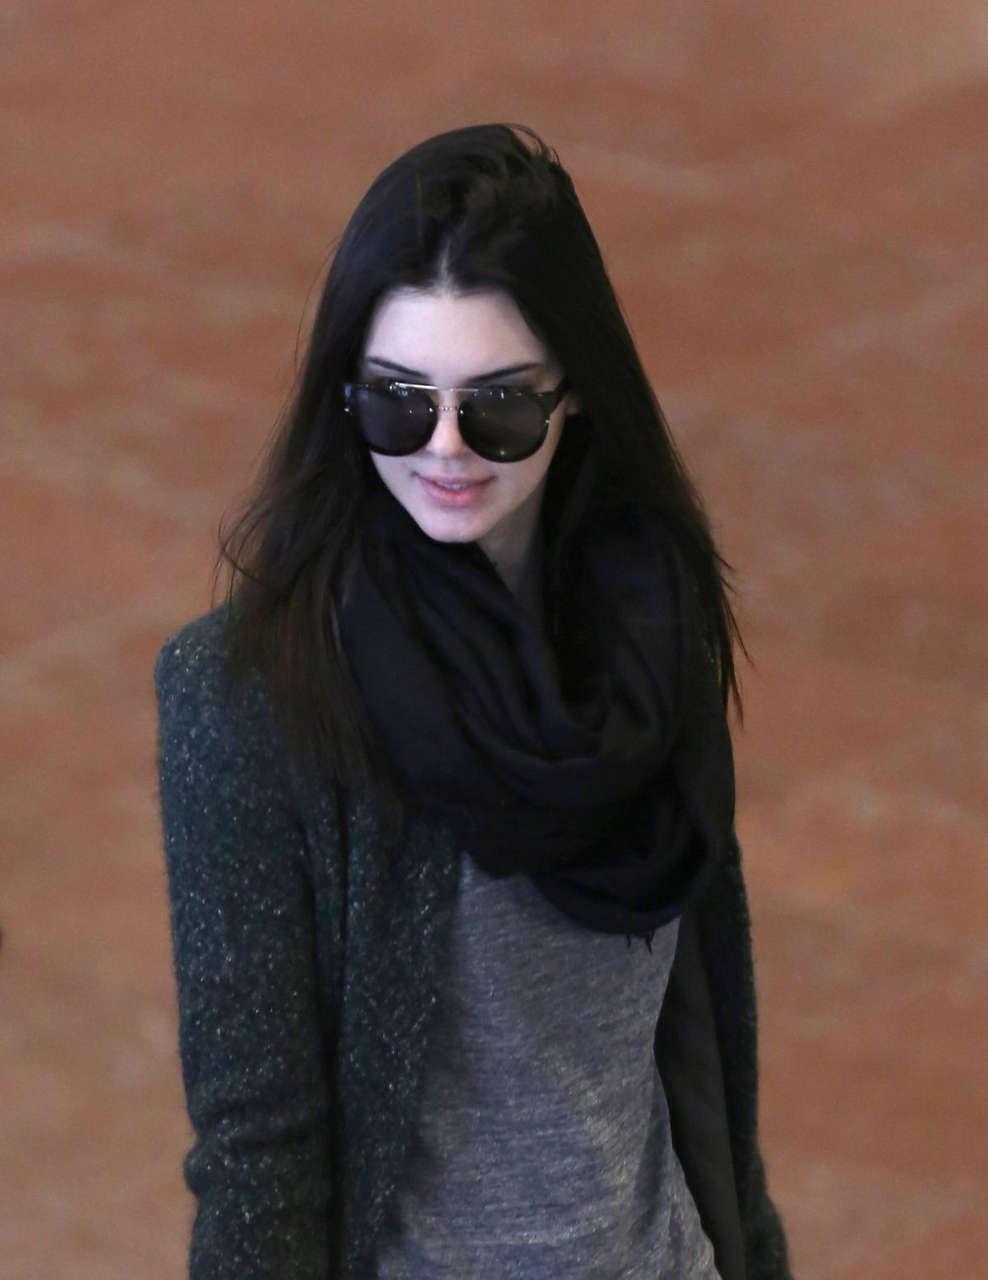 Kendall Jenner Charles De Gaulle Airport Paris